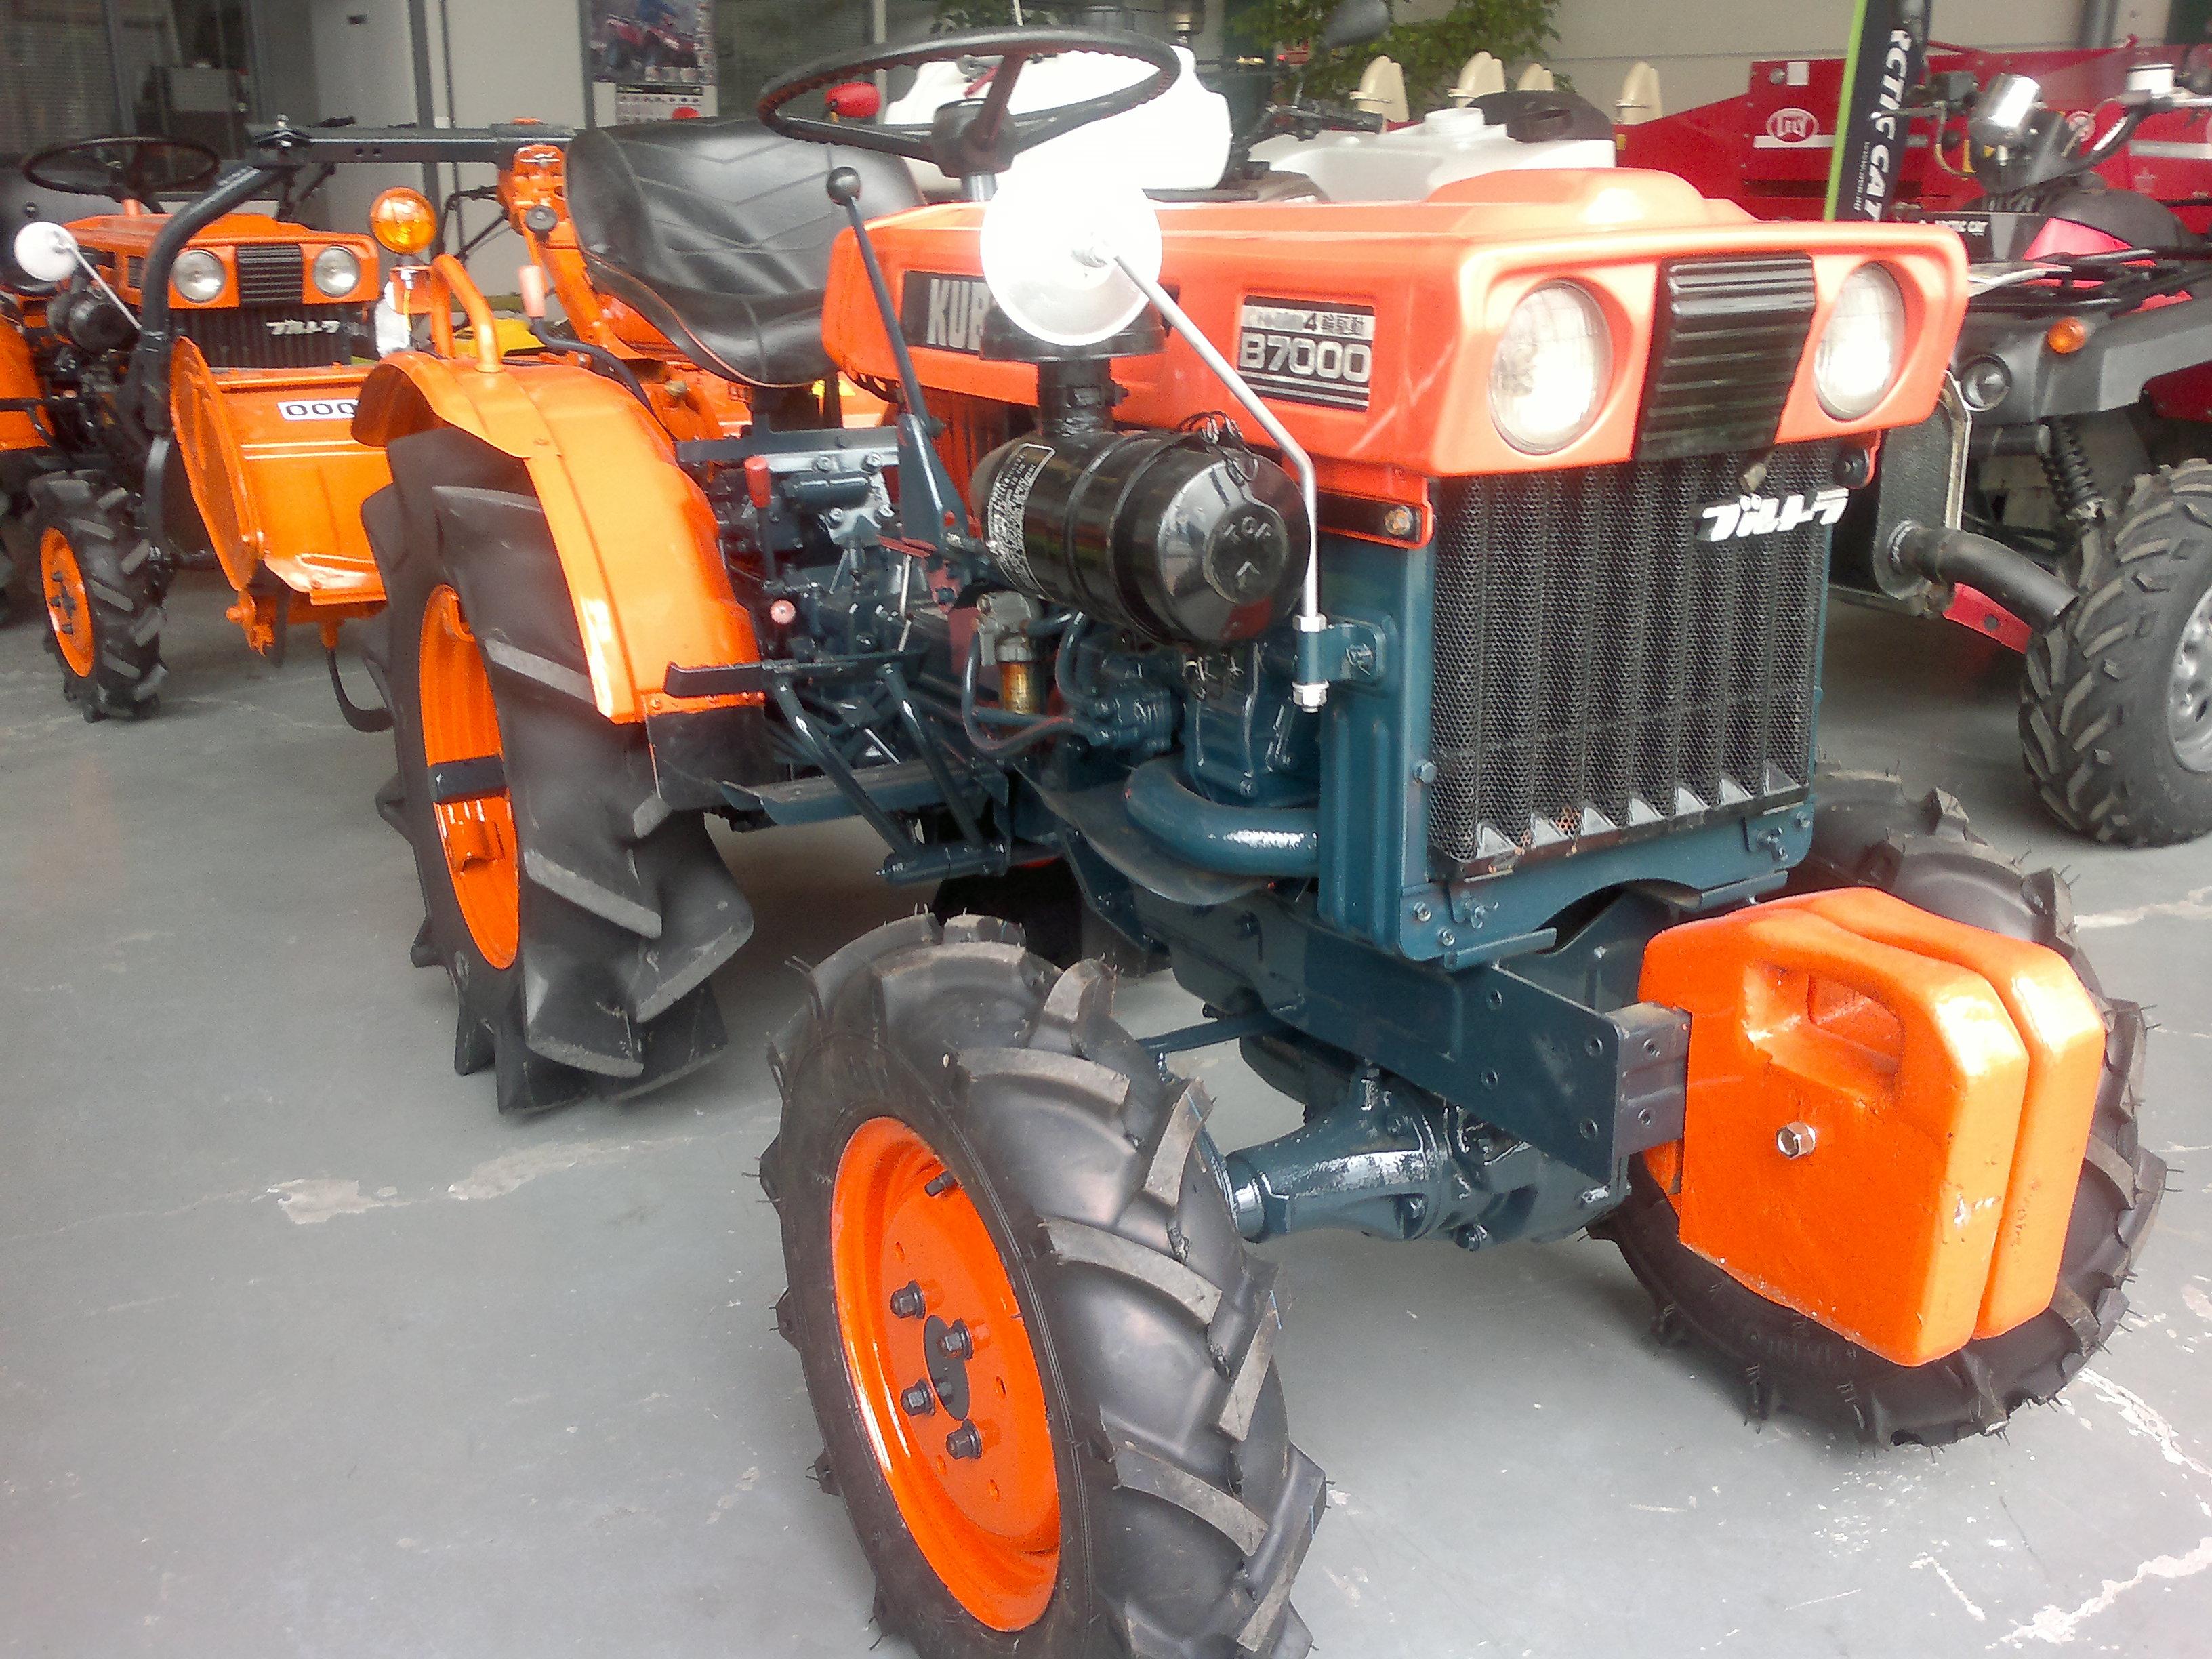 Mini tractor de ocasi n kubota b 7000 talleres hijos de for Naves prefabricadas de ocasion